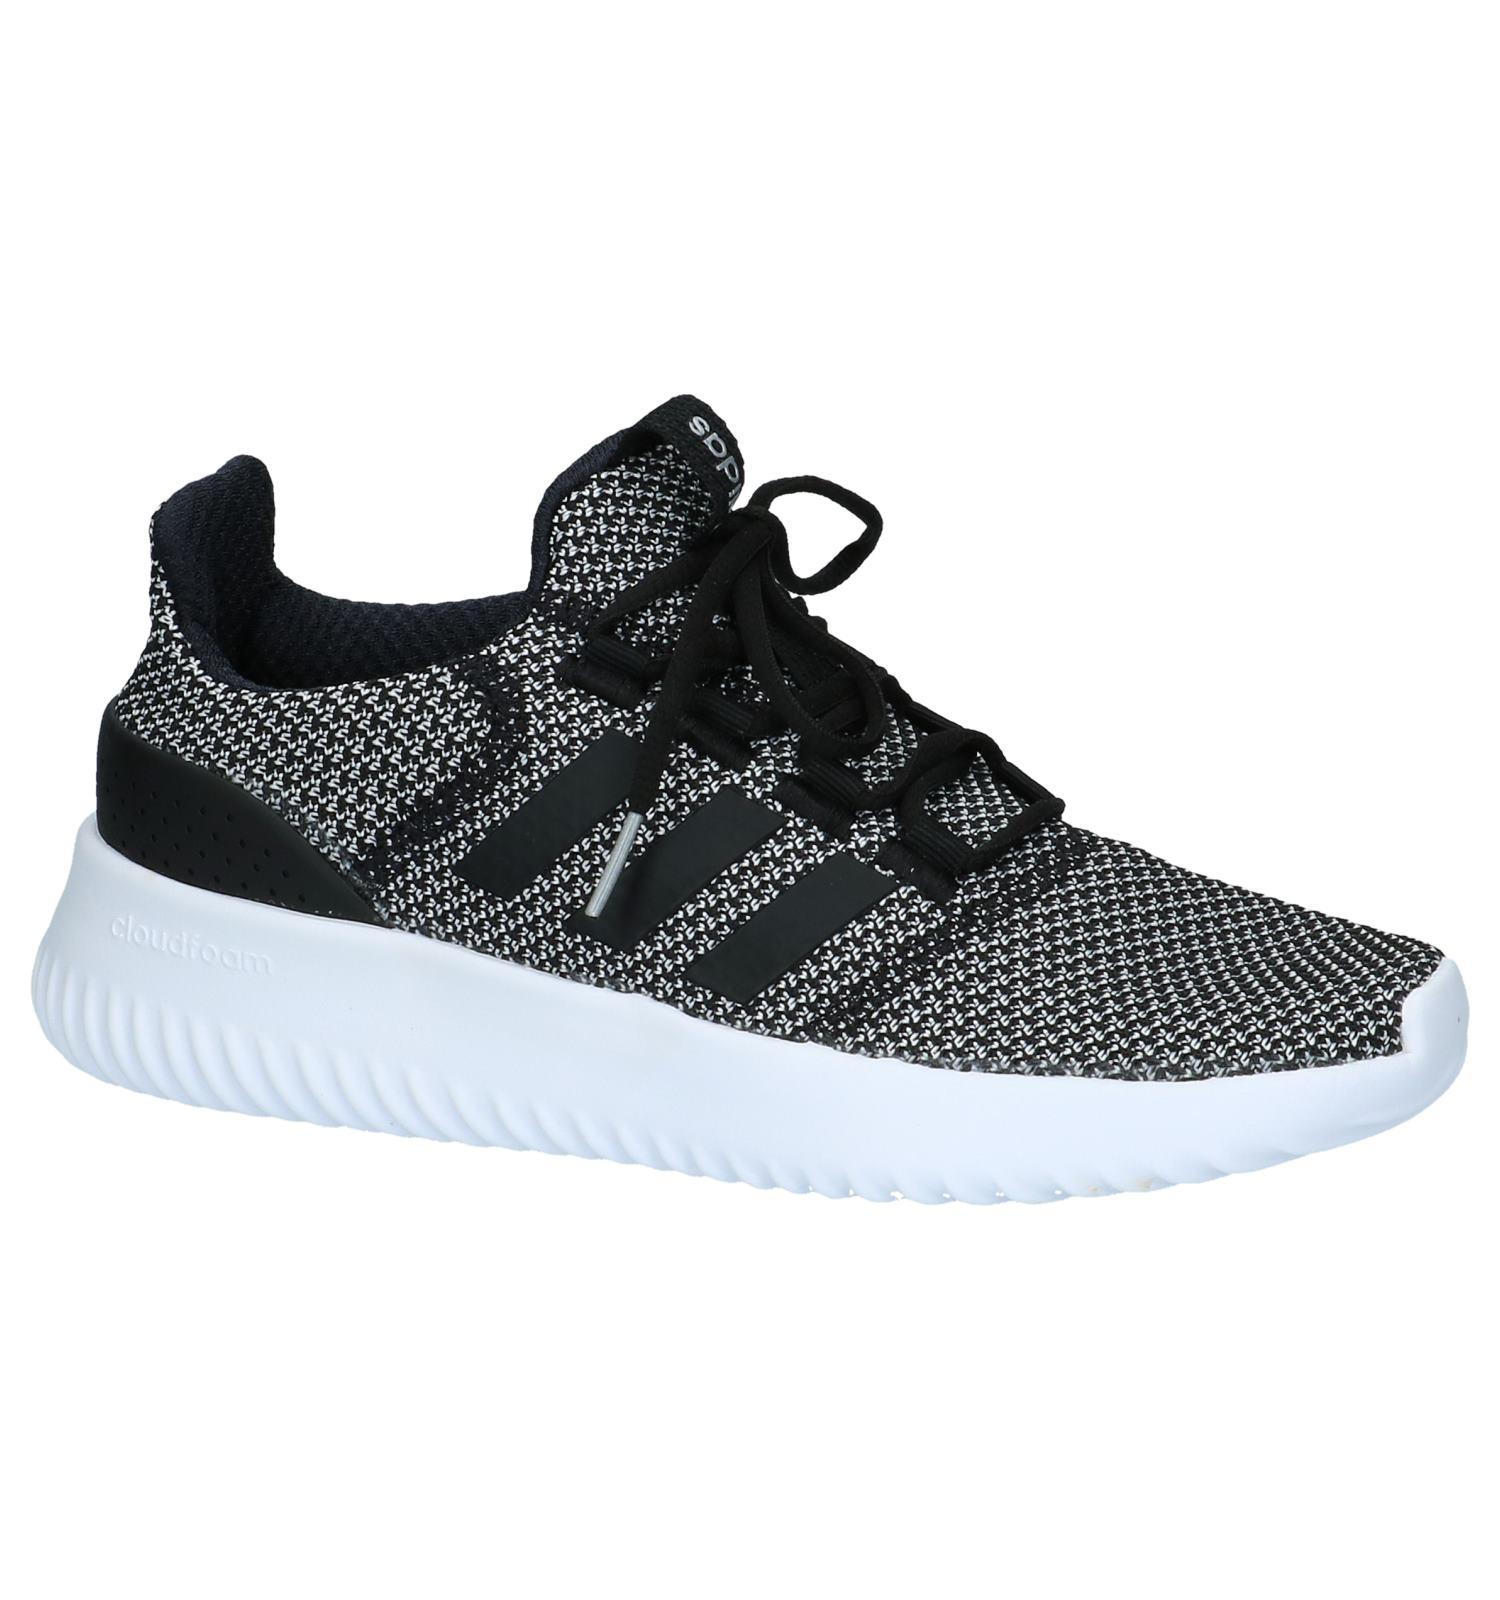 274e8e0e67a Zwarte Runner Sneakers adidas Cloudfoam Ultimate | TORFS.BE | Gratis  verzend en retour